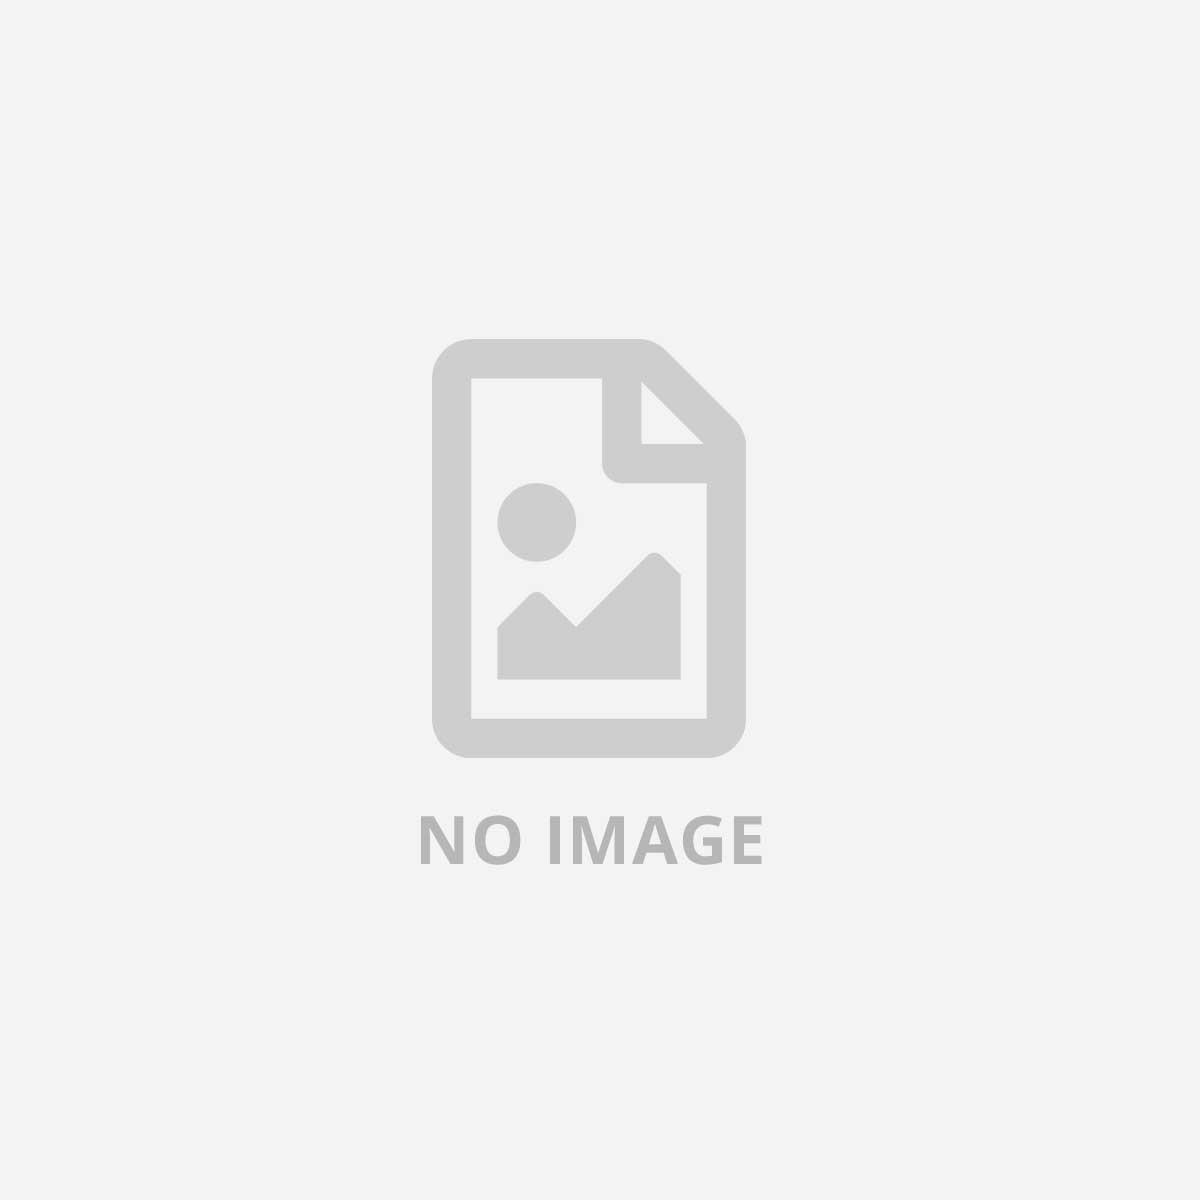 SHARP TV 24 HD READY SMART